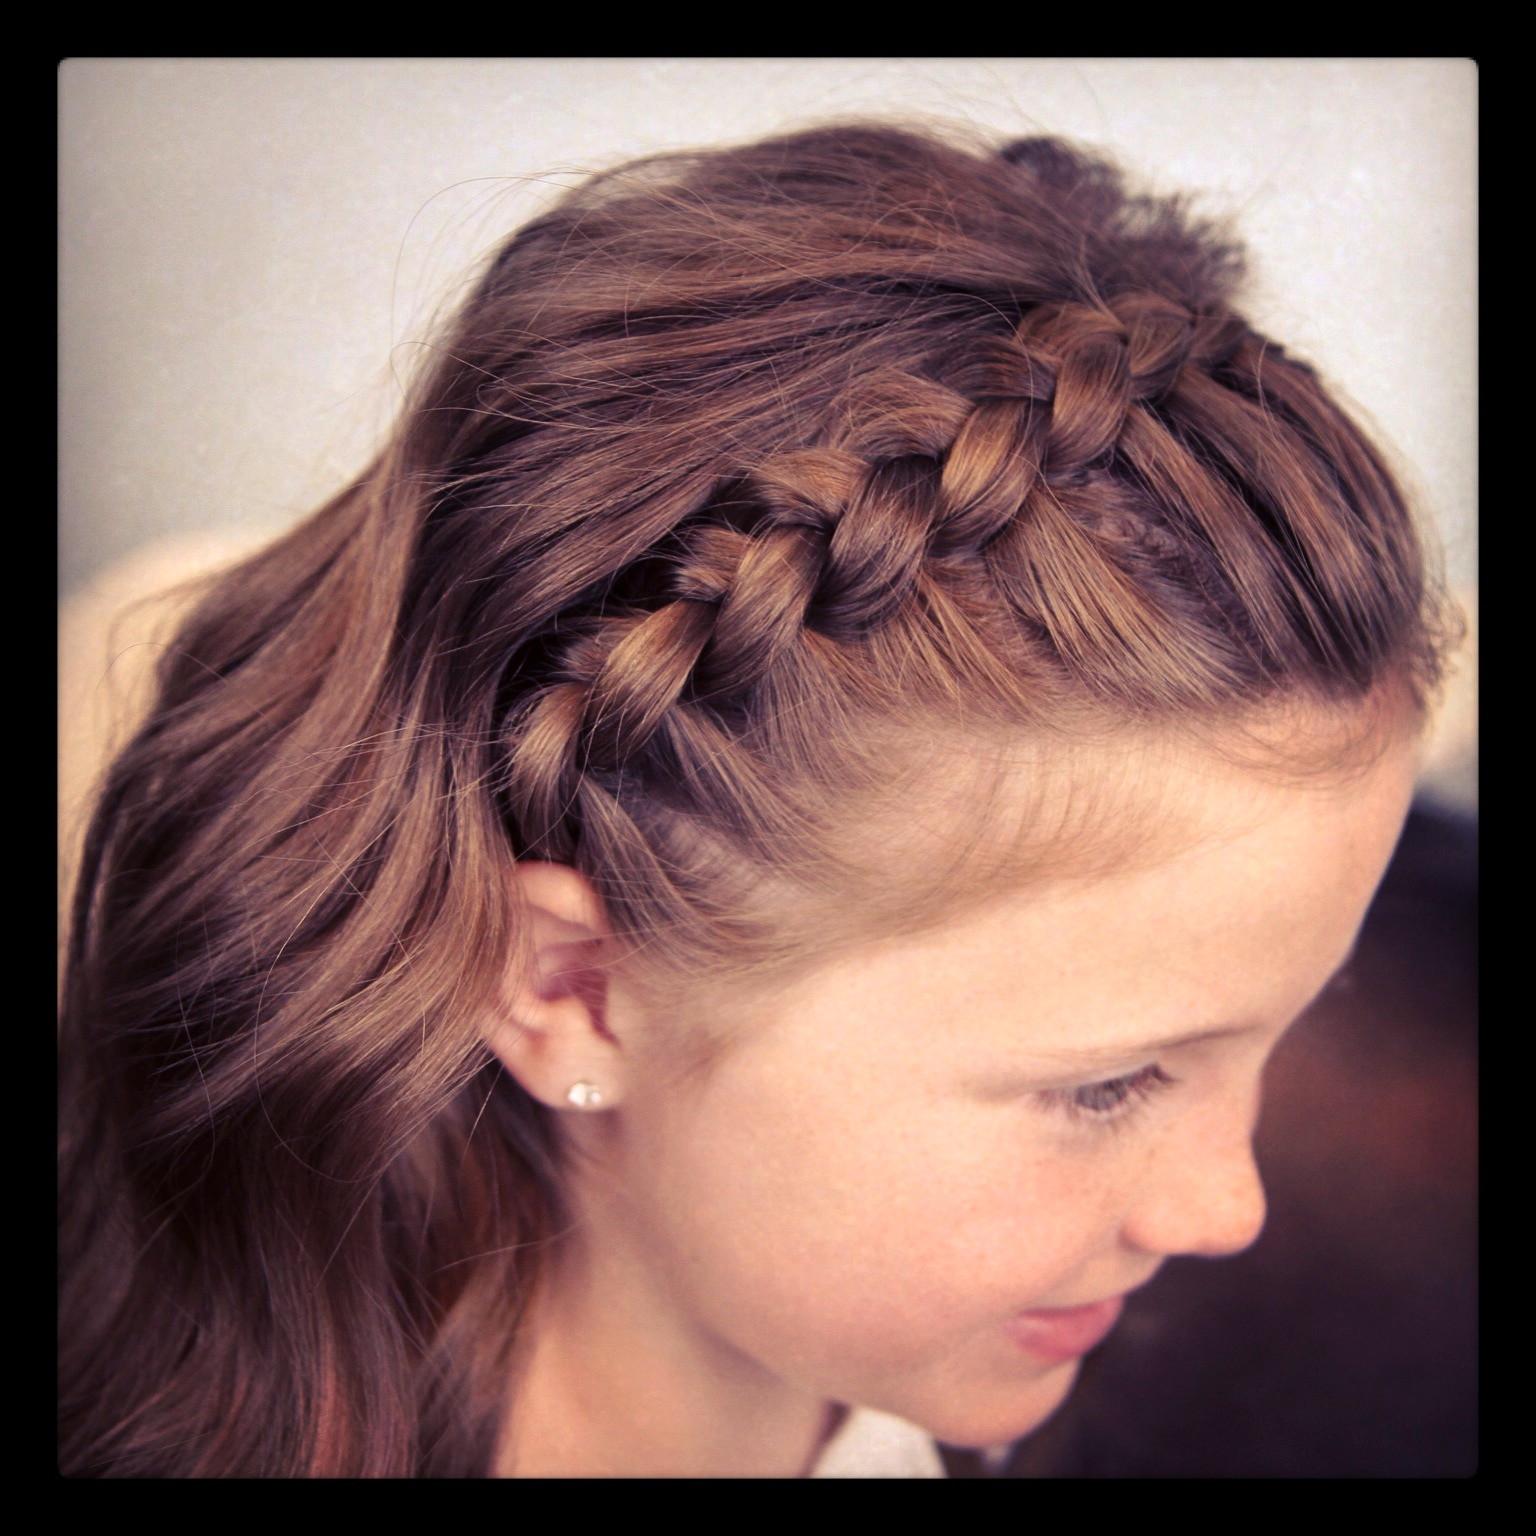 Headband Braids Hairstyles  Page not found